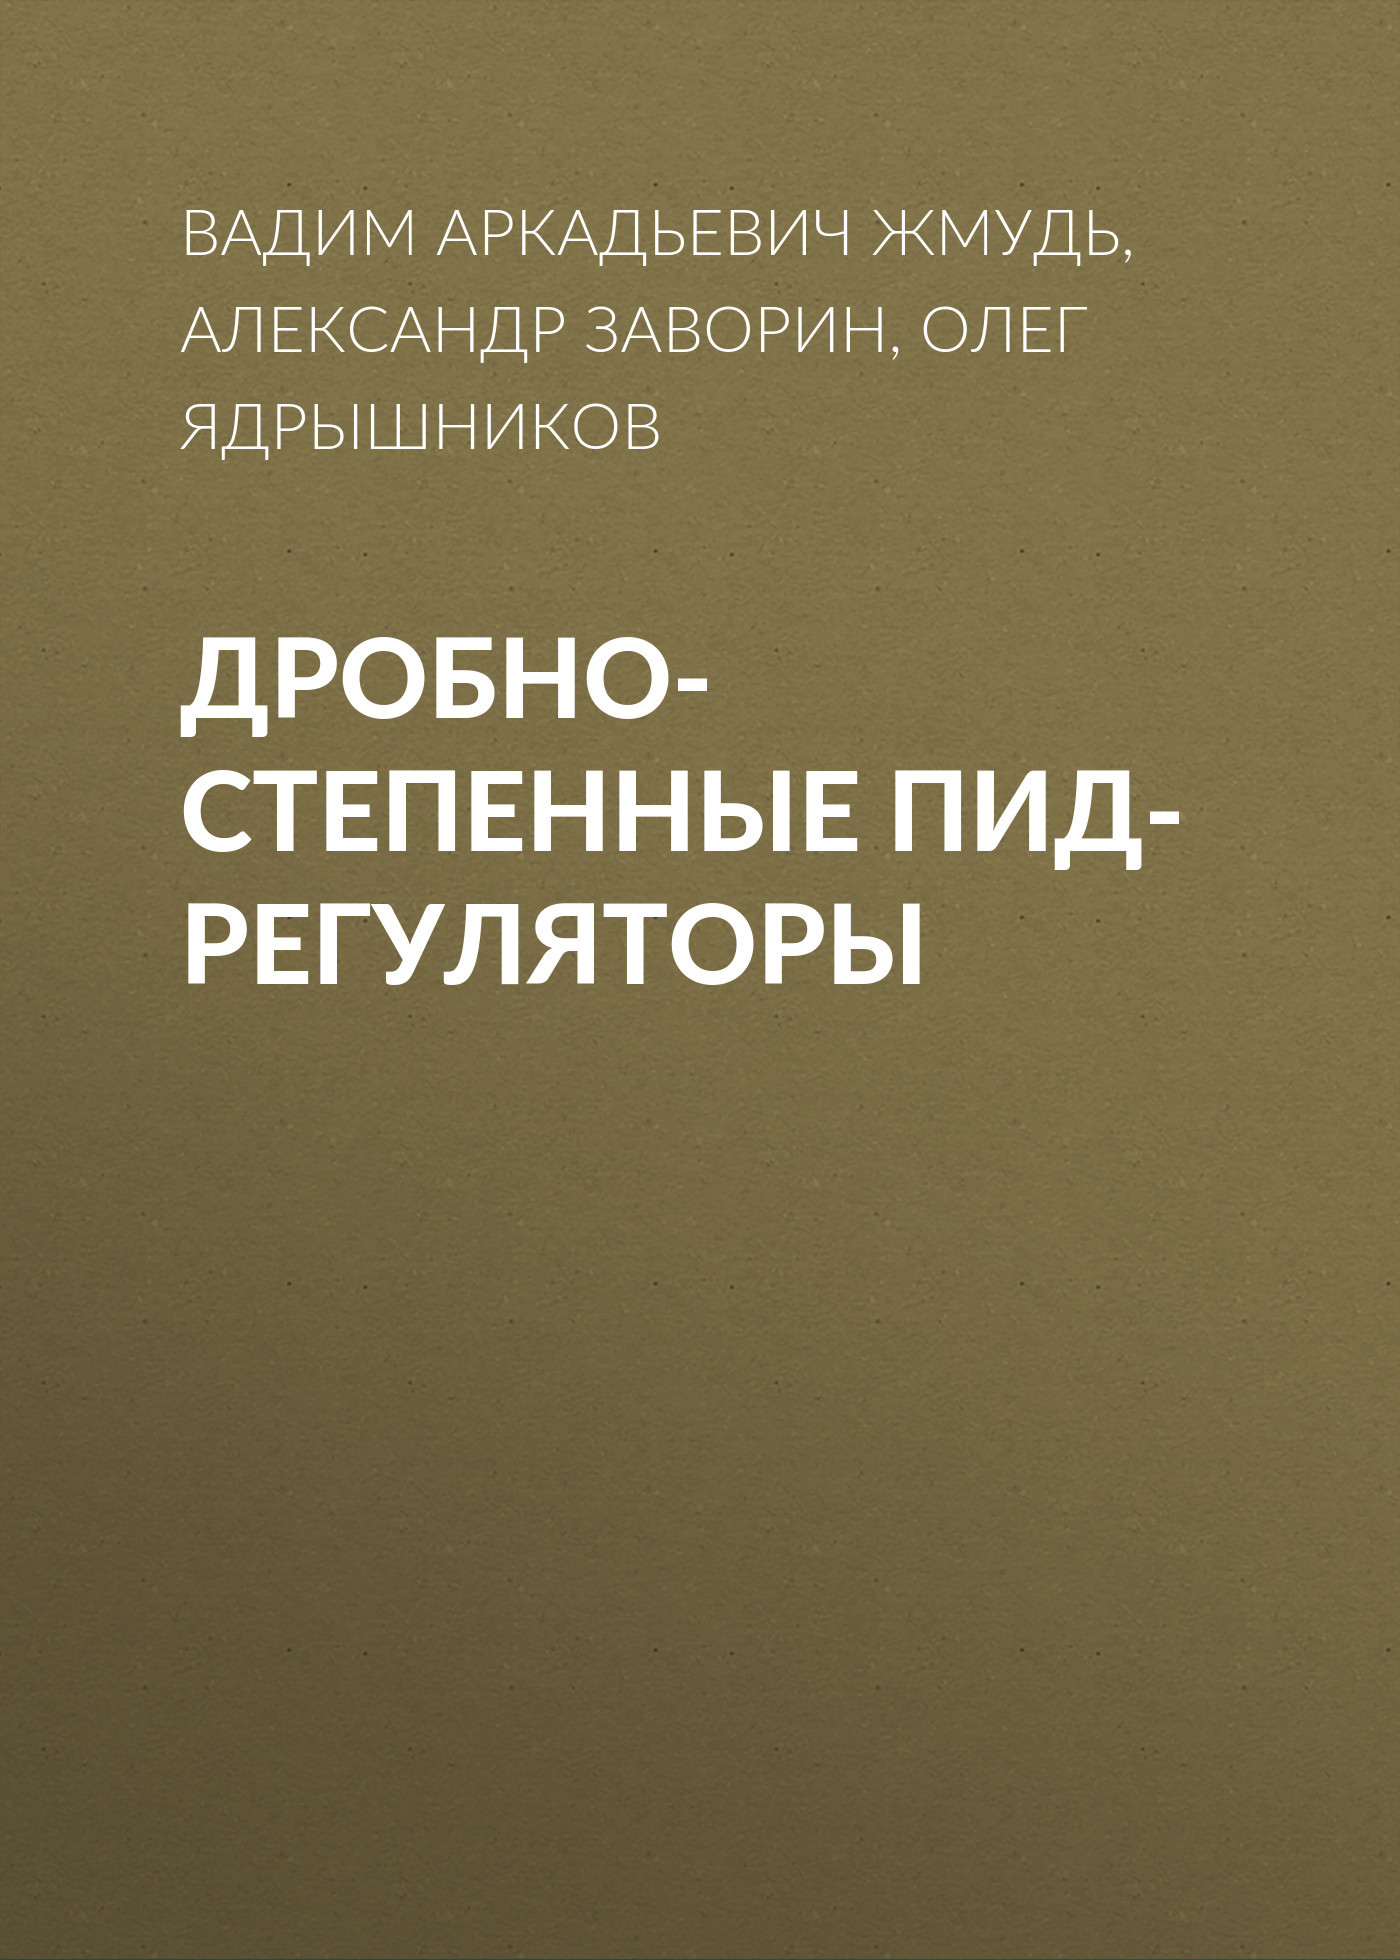 Вадим Аркадьевич Жмудь бесплатно